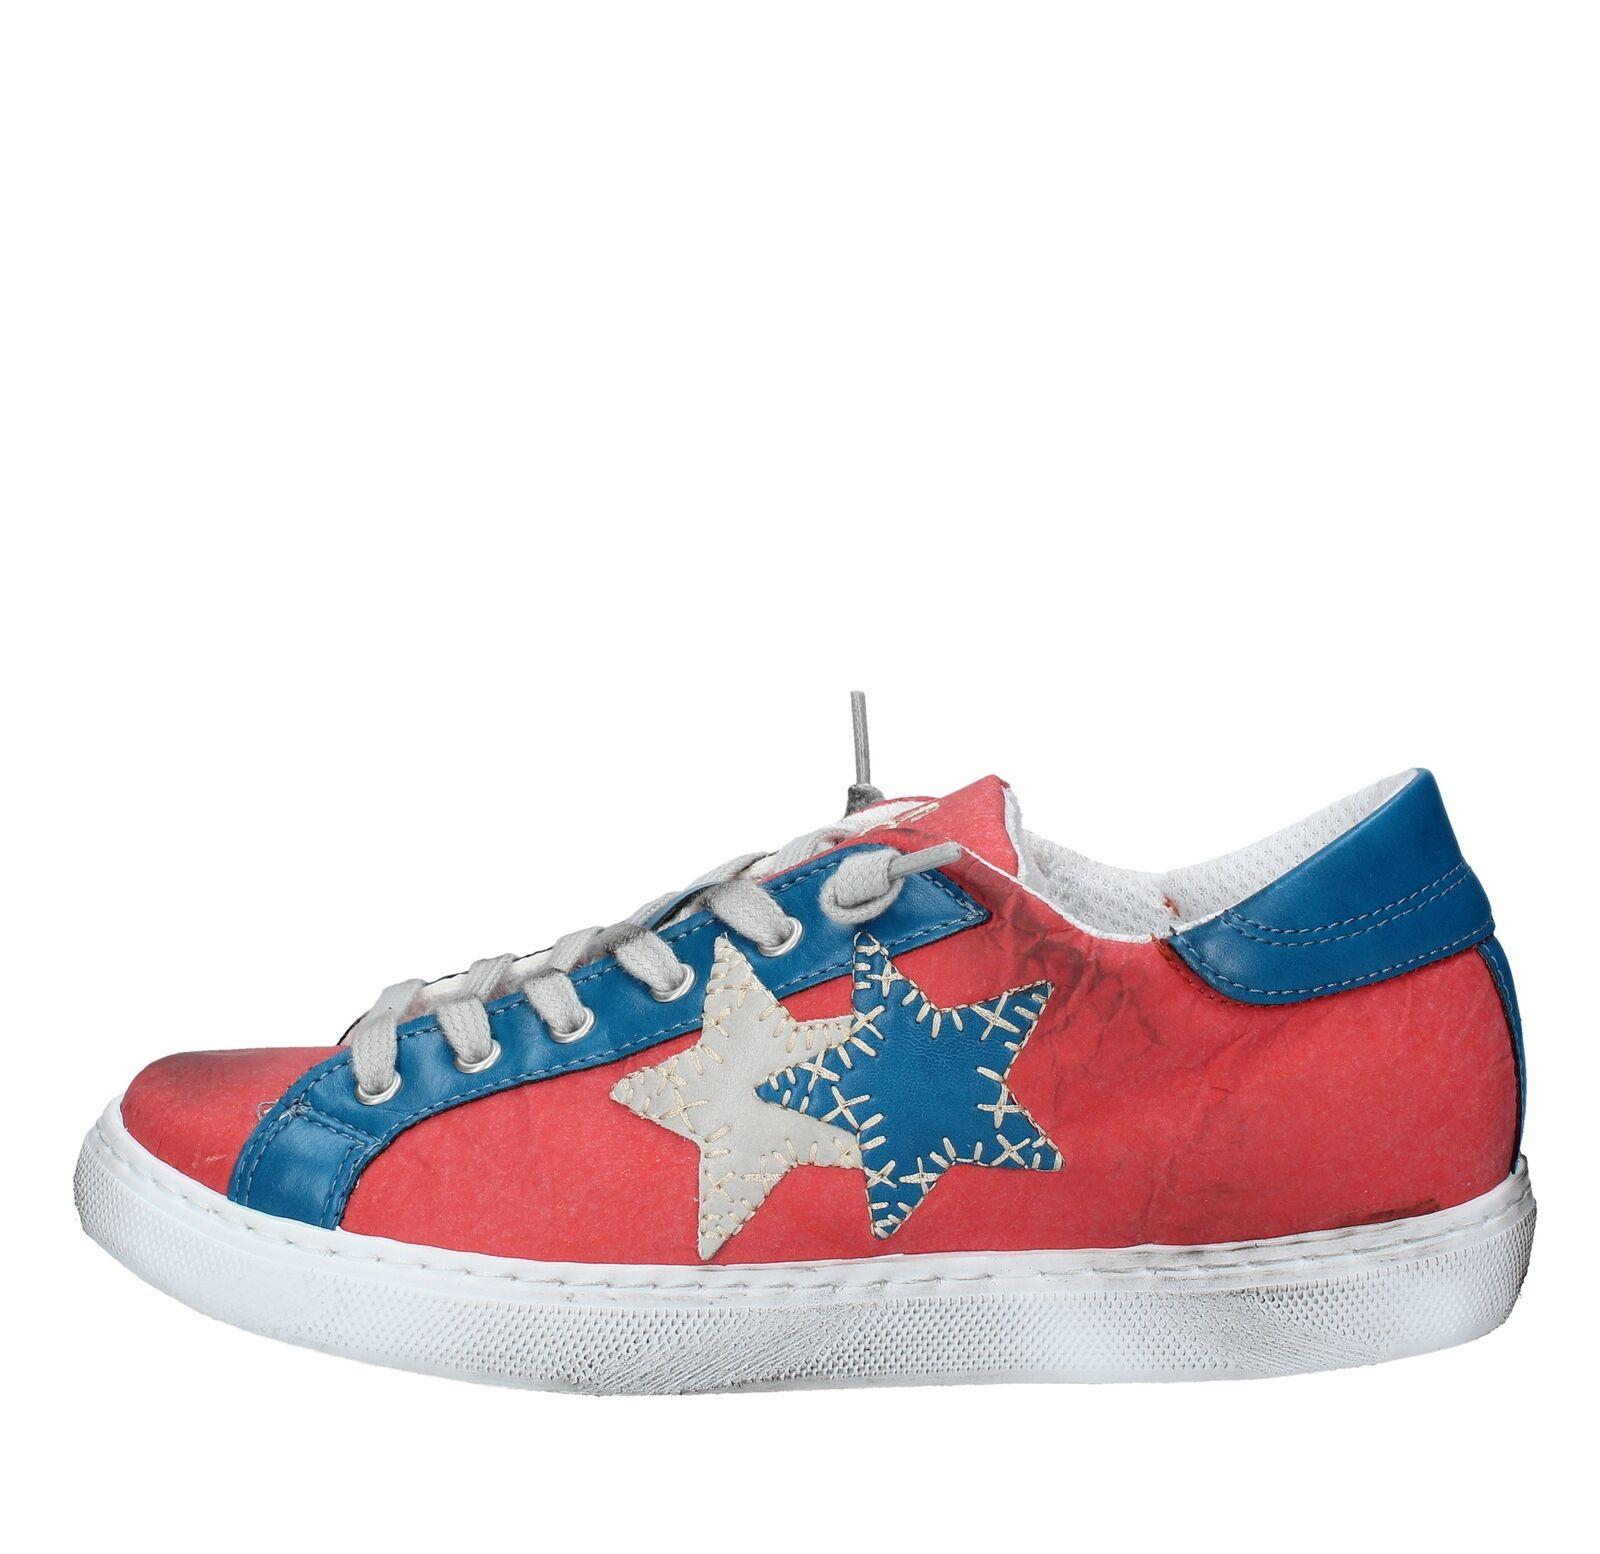 AMF60_2STA Scarpe scarpe da ginnastica 2STAR donna MultiColoreeee | Bel Bel Bel design  | Scolaro/Ragazze Scarpa  1a4fa3